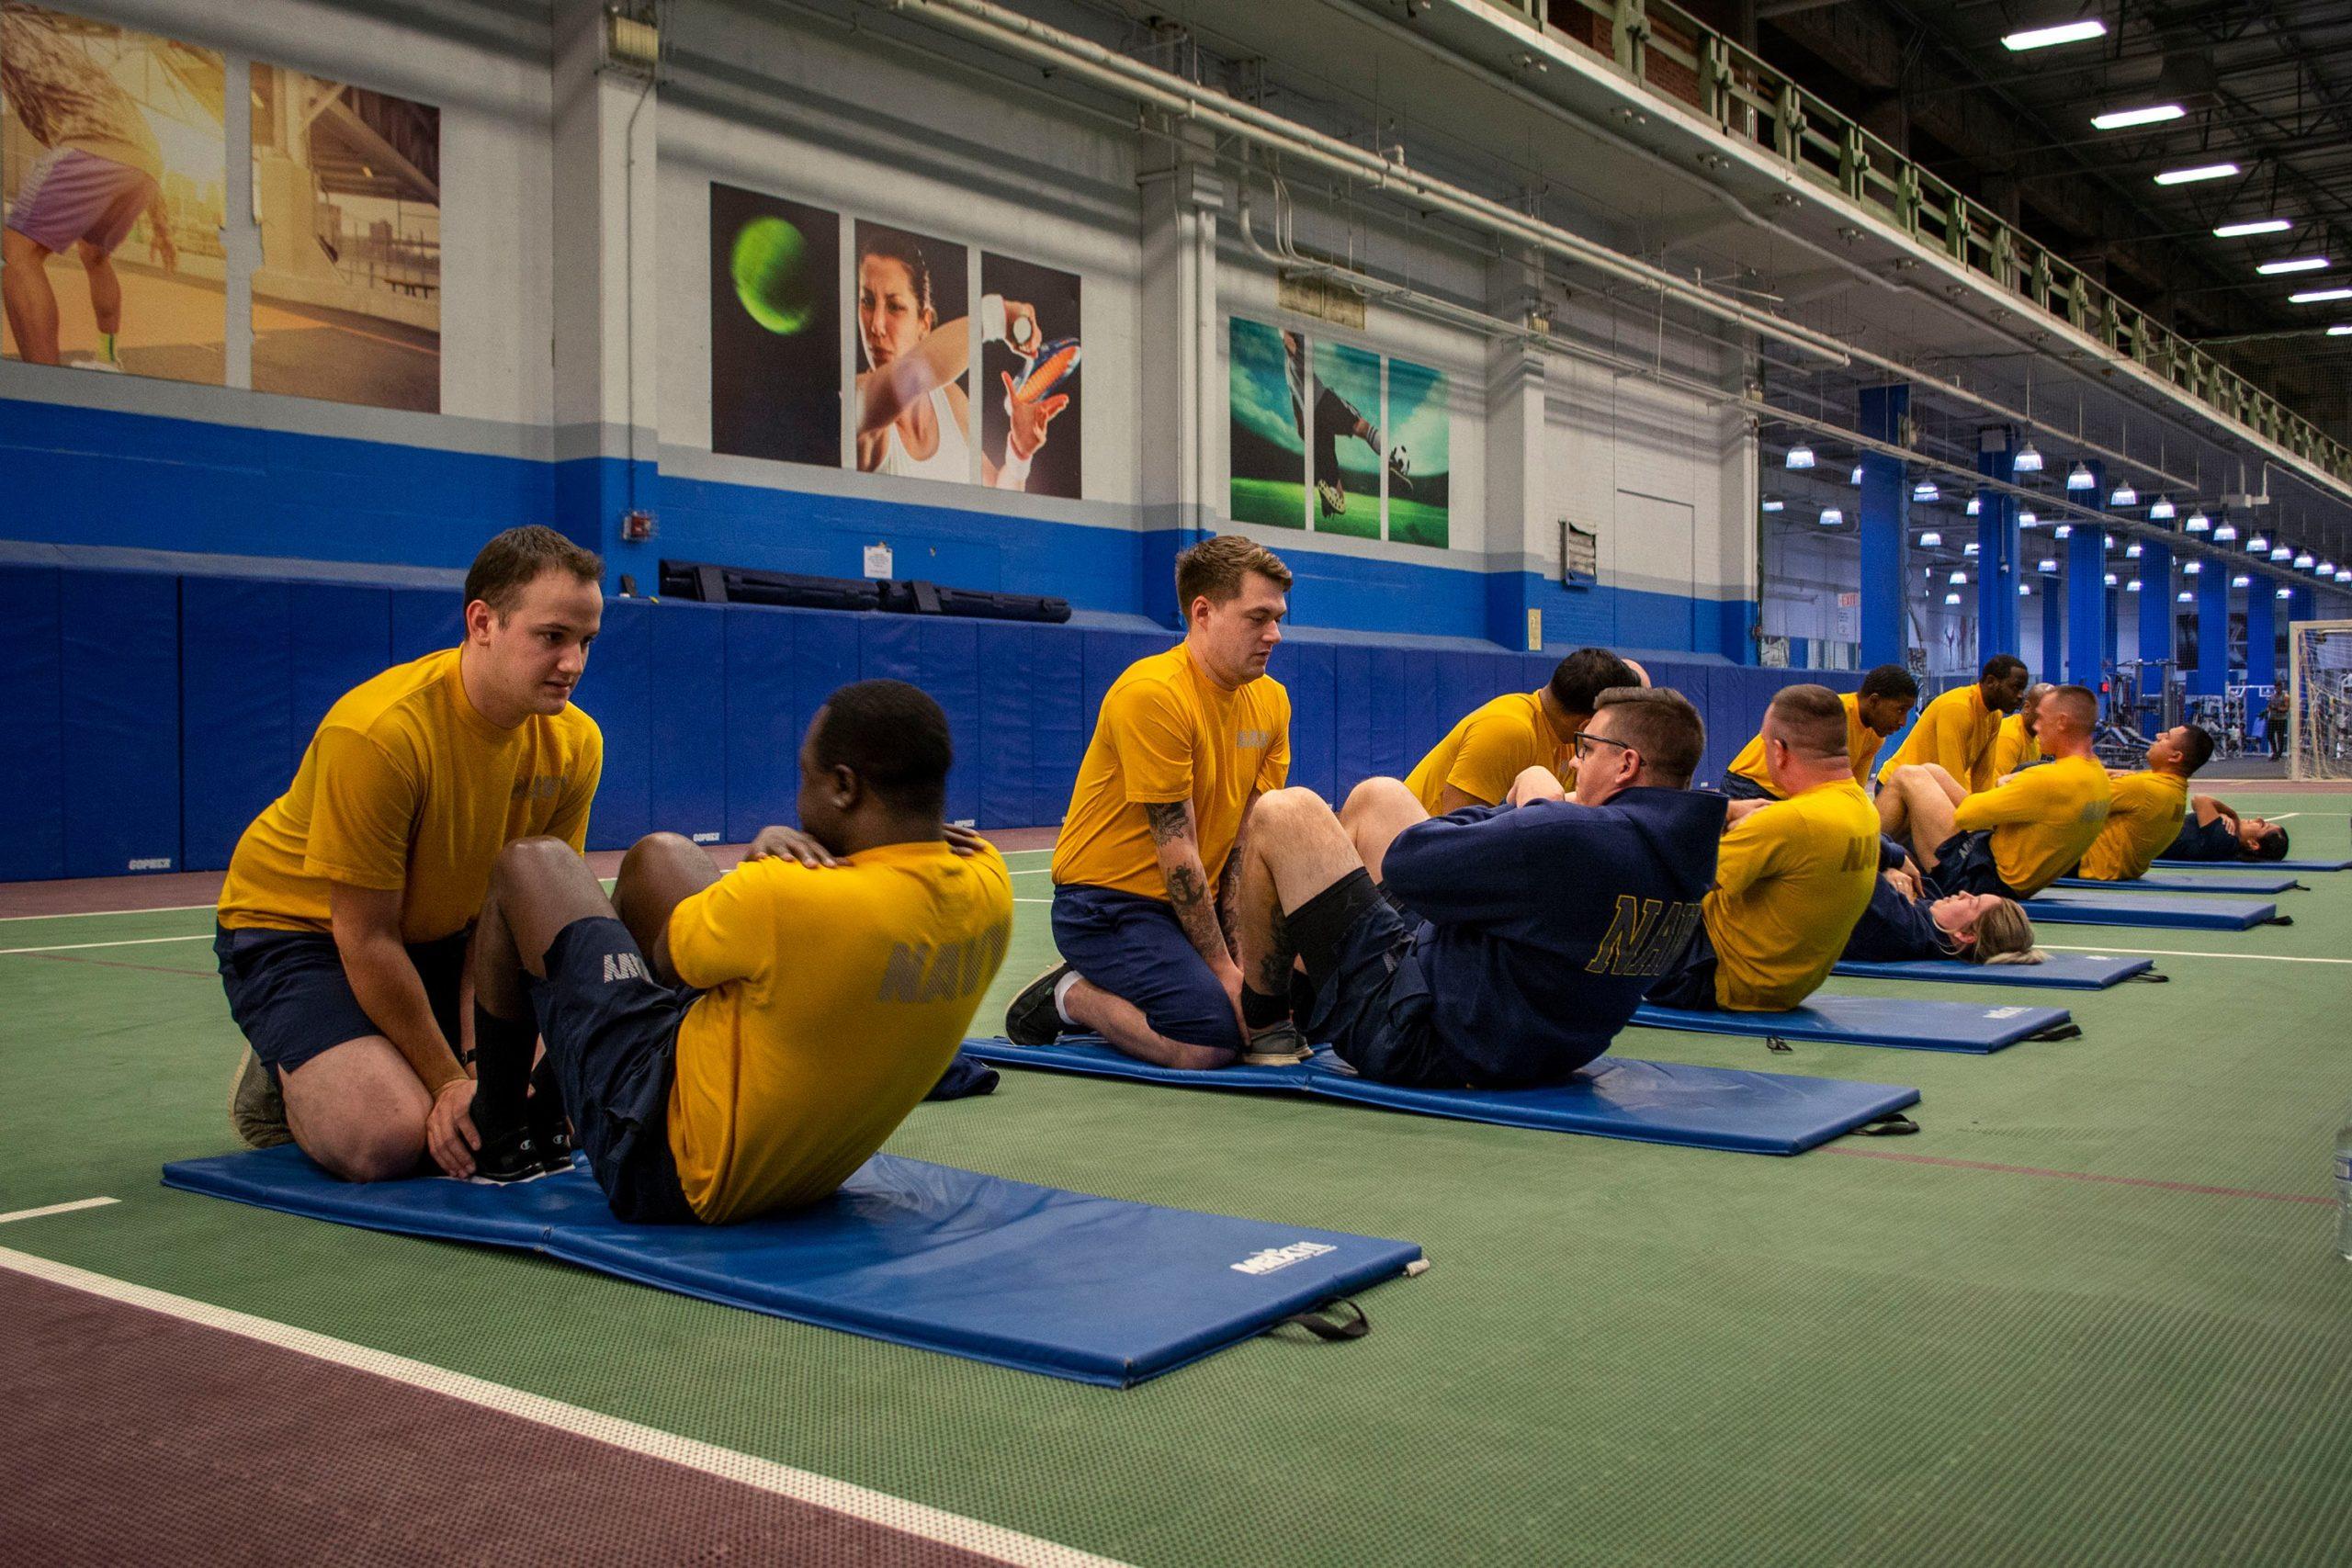 U.S. Navy Fitness